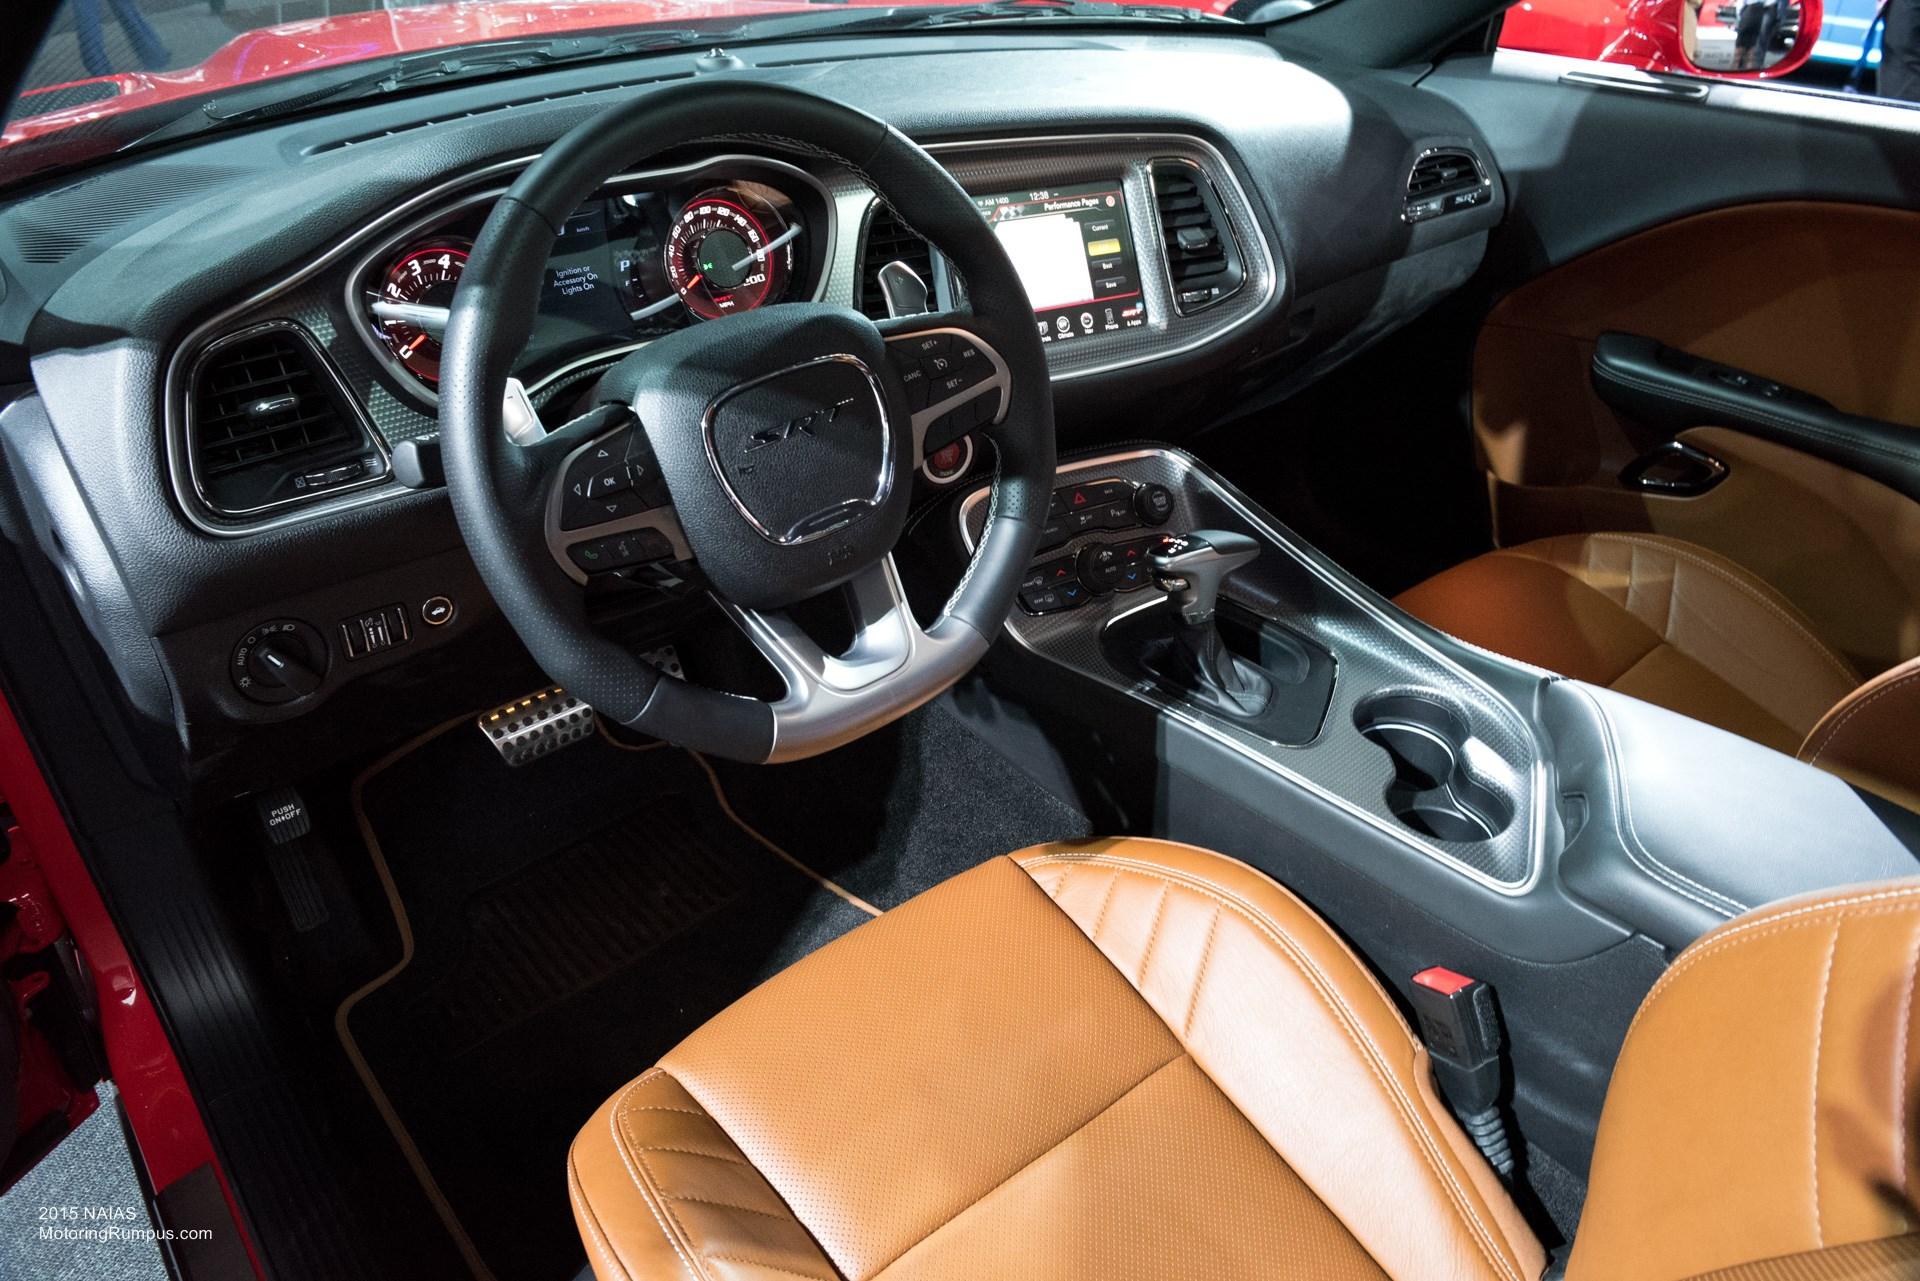 2015 NAIAS Dodge Challenger SRT Hellcat Laguna Leather